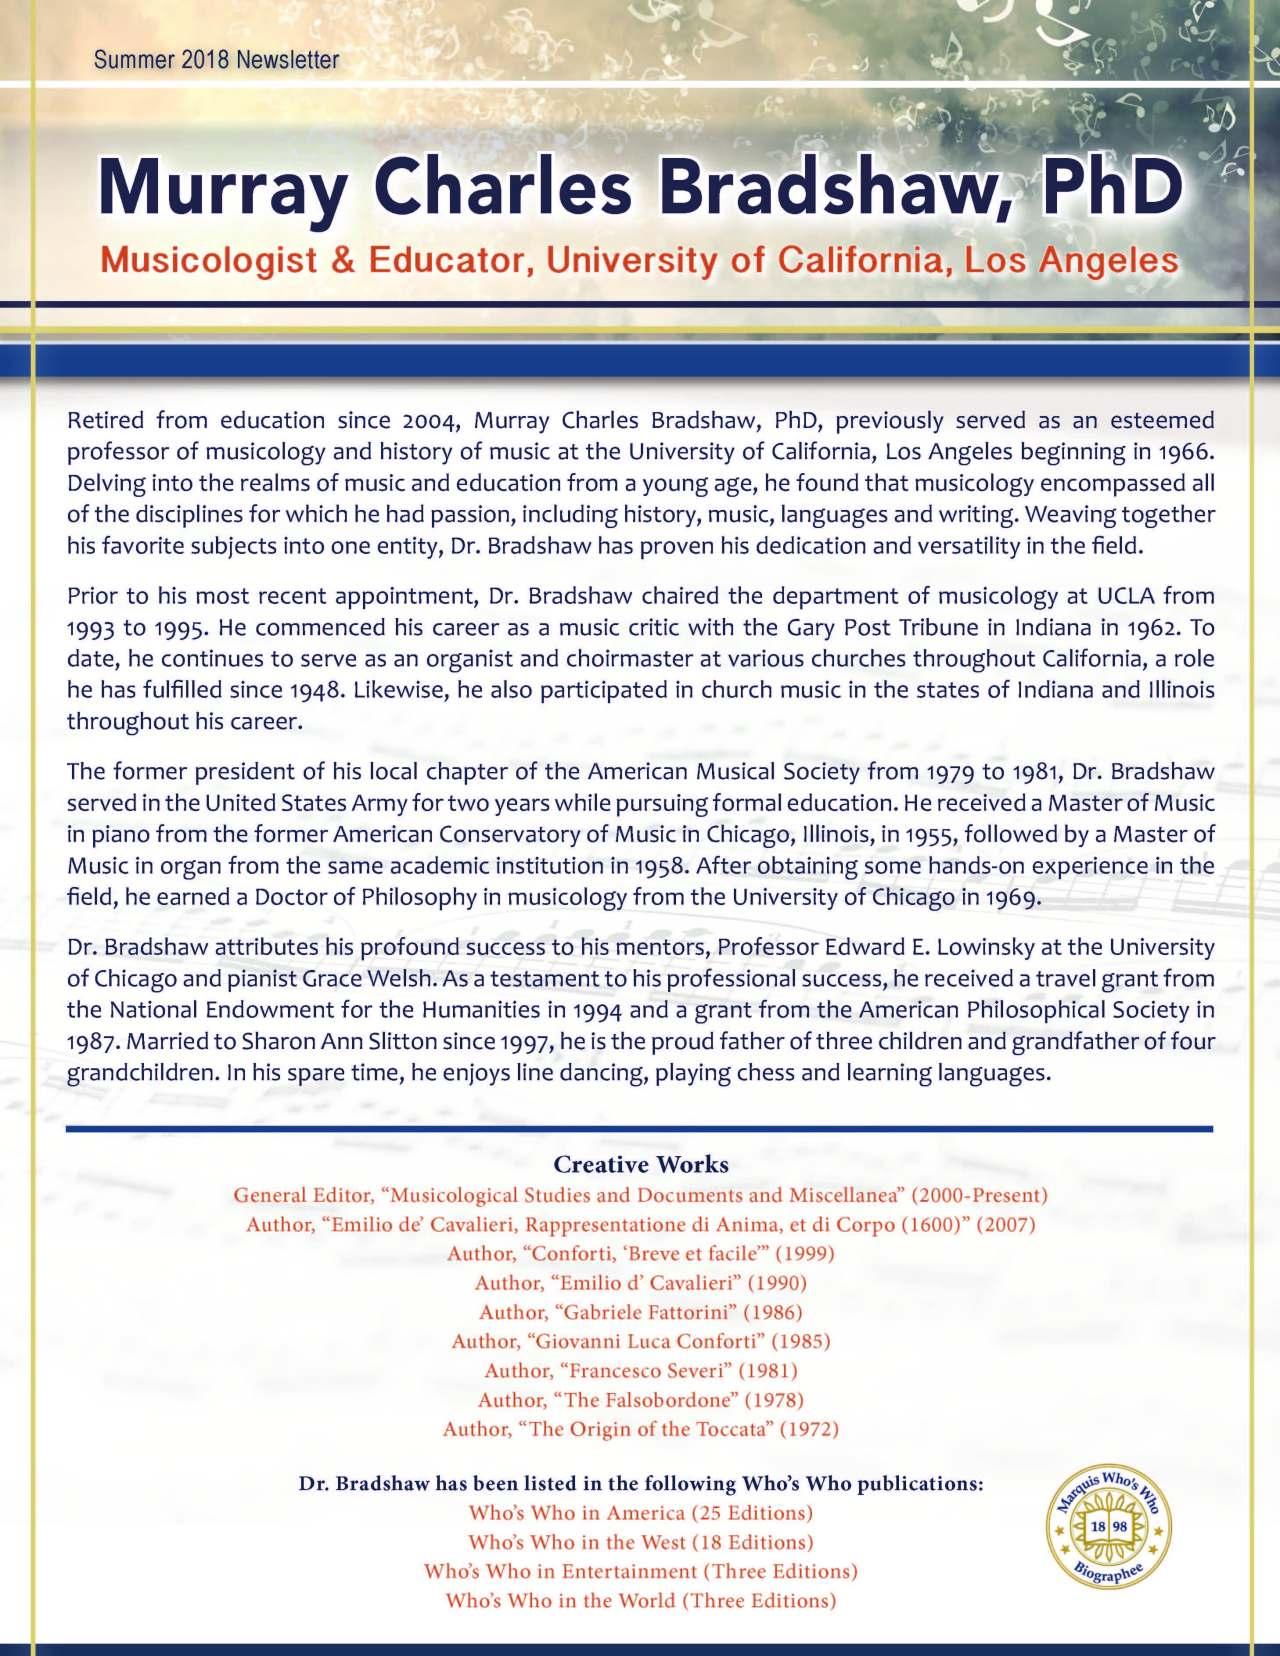 Bradshaw, Murray 3967086_15341233 Newsletter.jpg